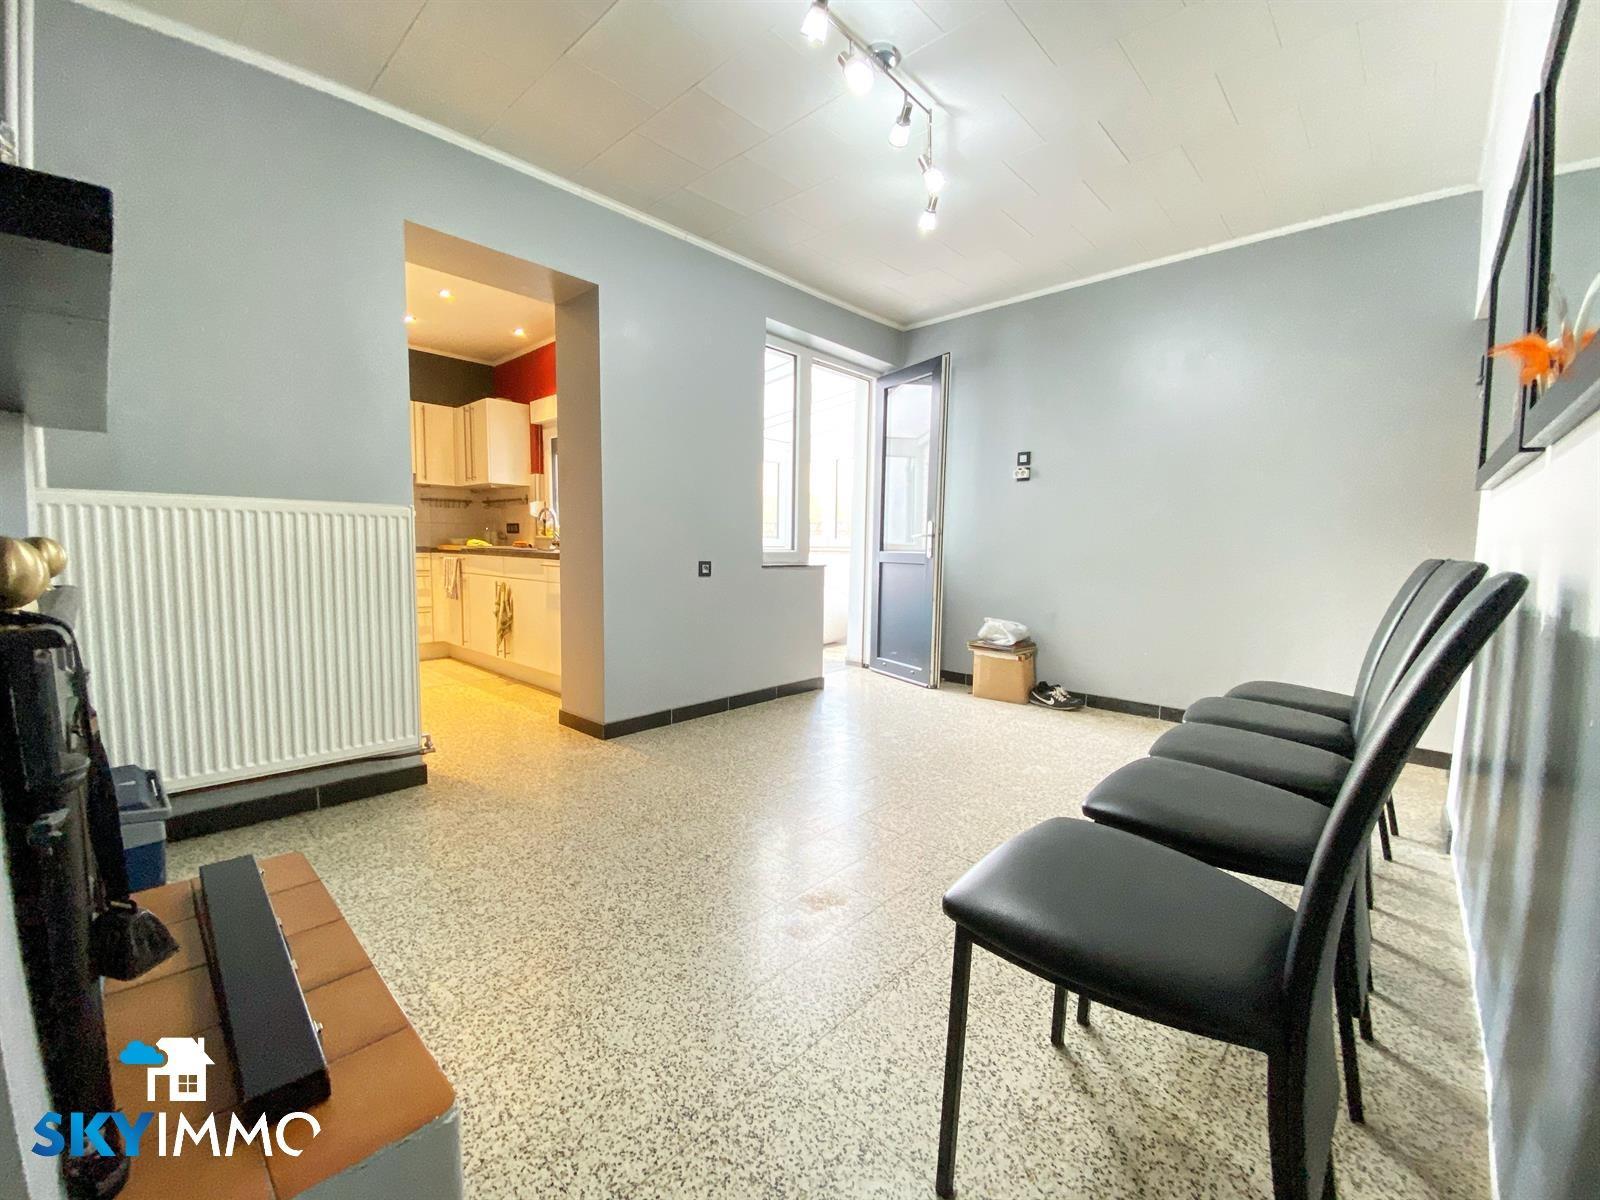 Maison - Saint-Nicolas - #4287983-5